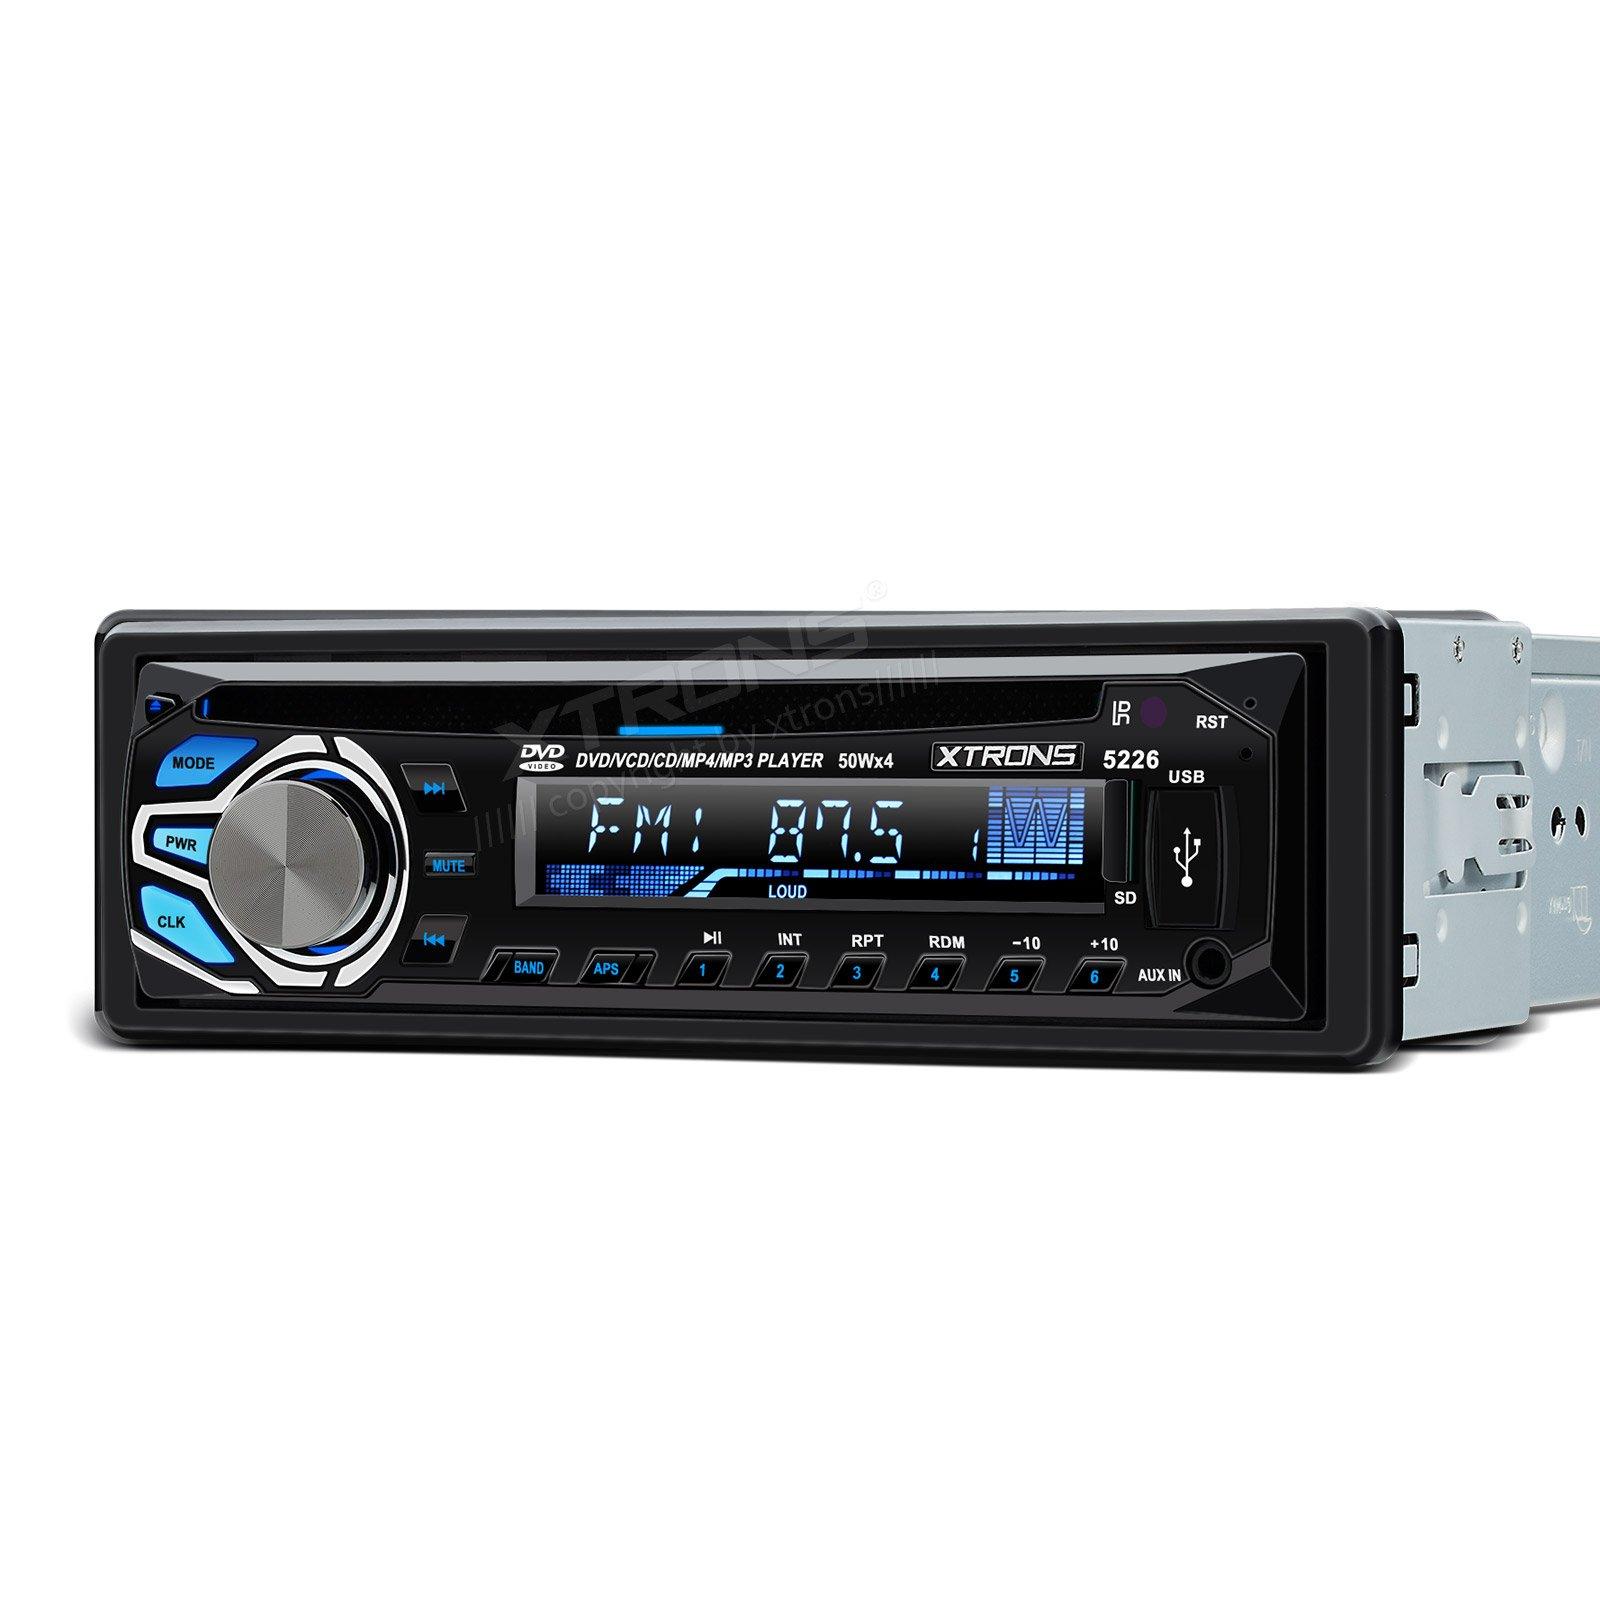 XTRONS Universal 24V In-dash 1 Single DIN Car Stereo LCD Screen FM USB SD MP3 CD VCD DVD Player